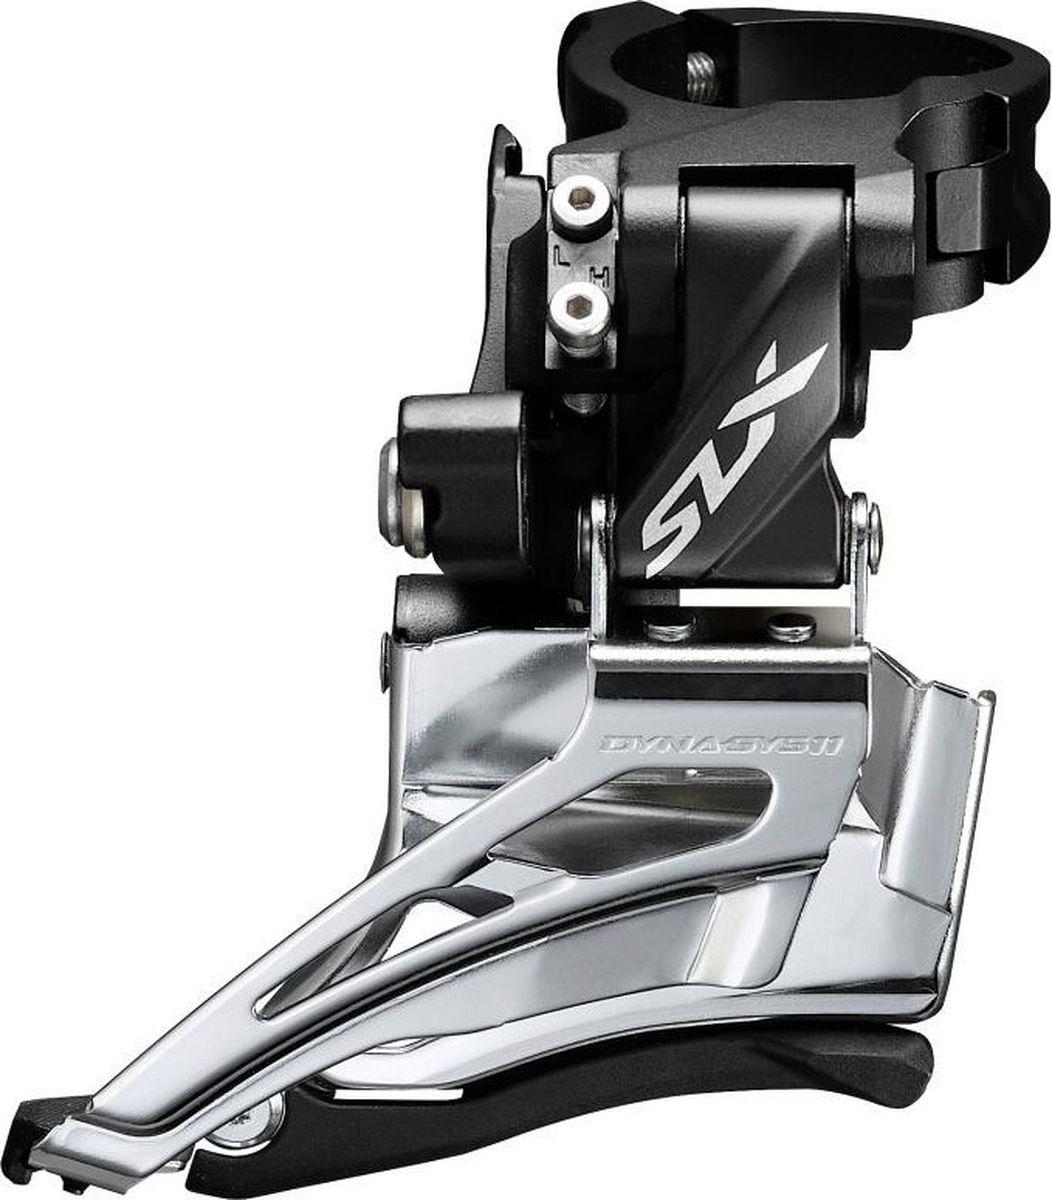 Переключатель передний Shimano SLX M7025-H, для 2 х 11 скоростей, верхний хомут, универсальная тяга батарею для тексет 7025